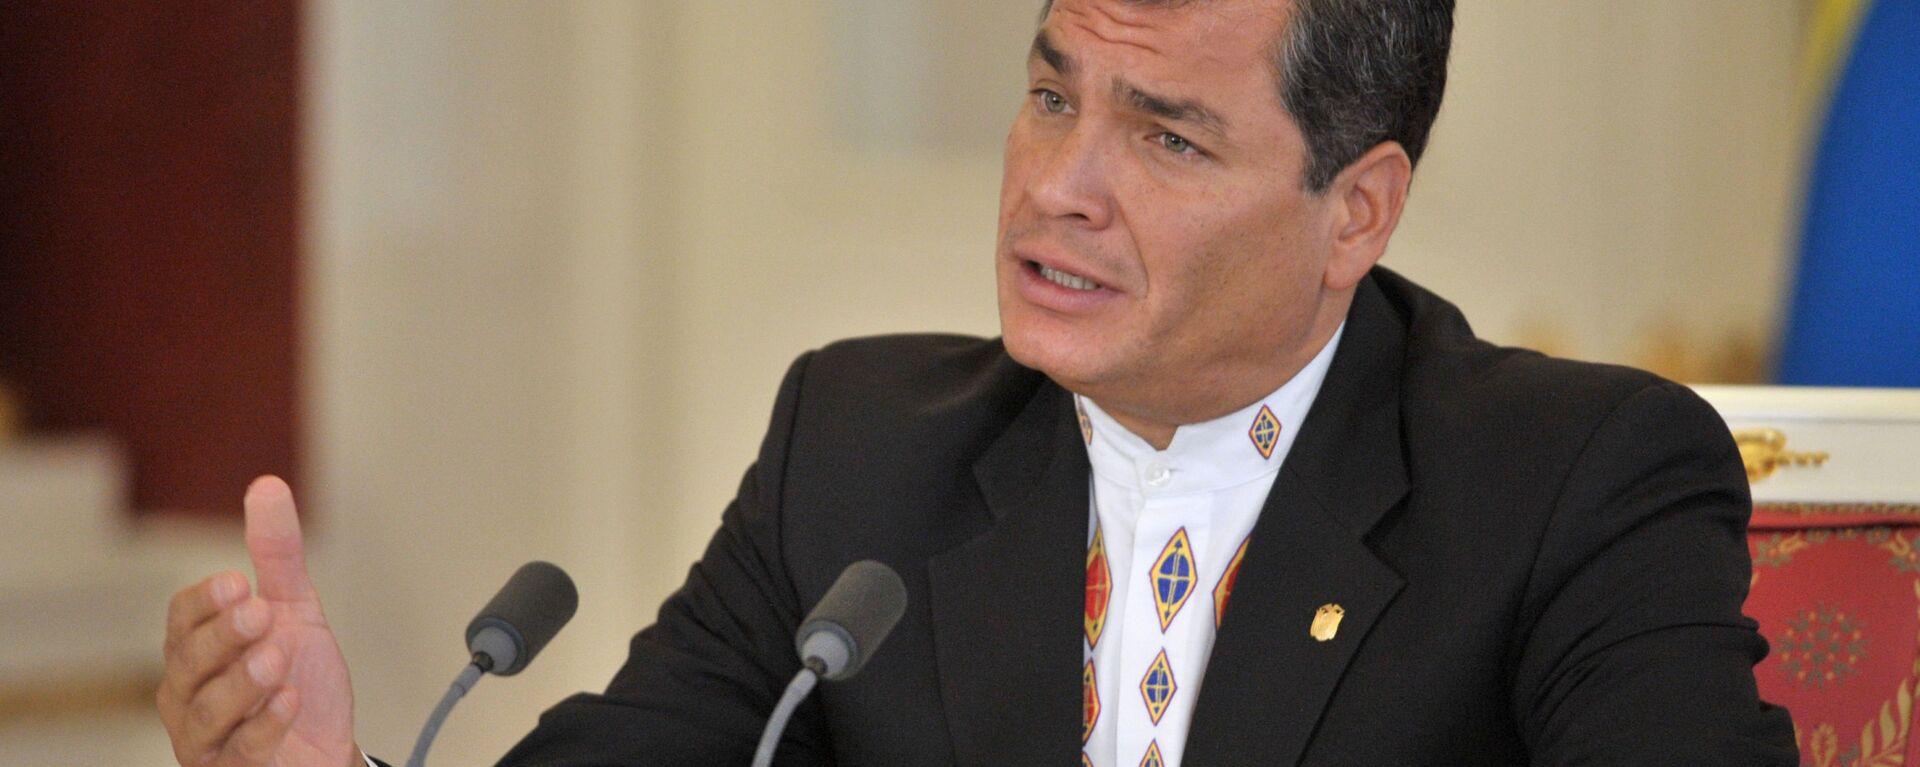 Rafael Correa, expresidente de Ecuador - Sputnik Mundo, 1920, 07.05.2021